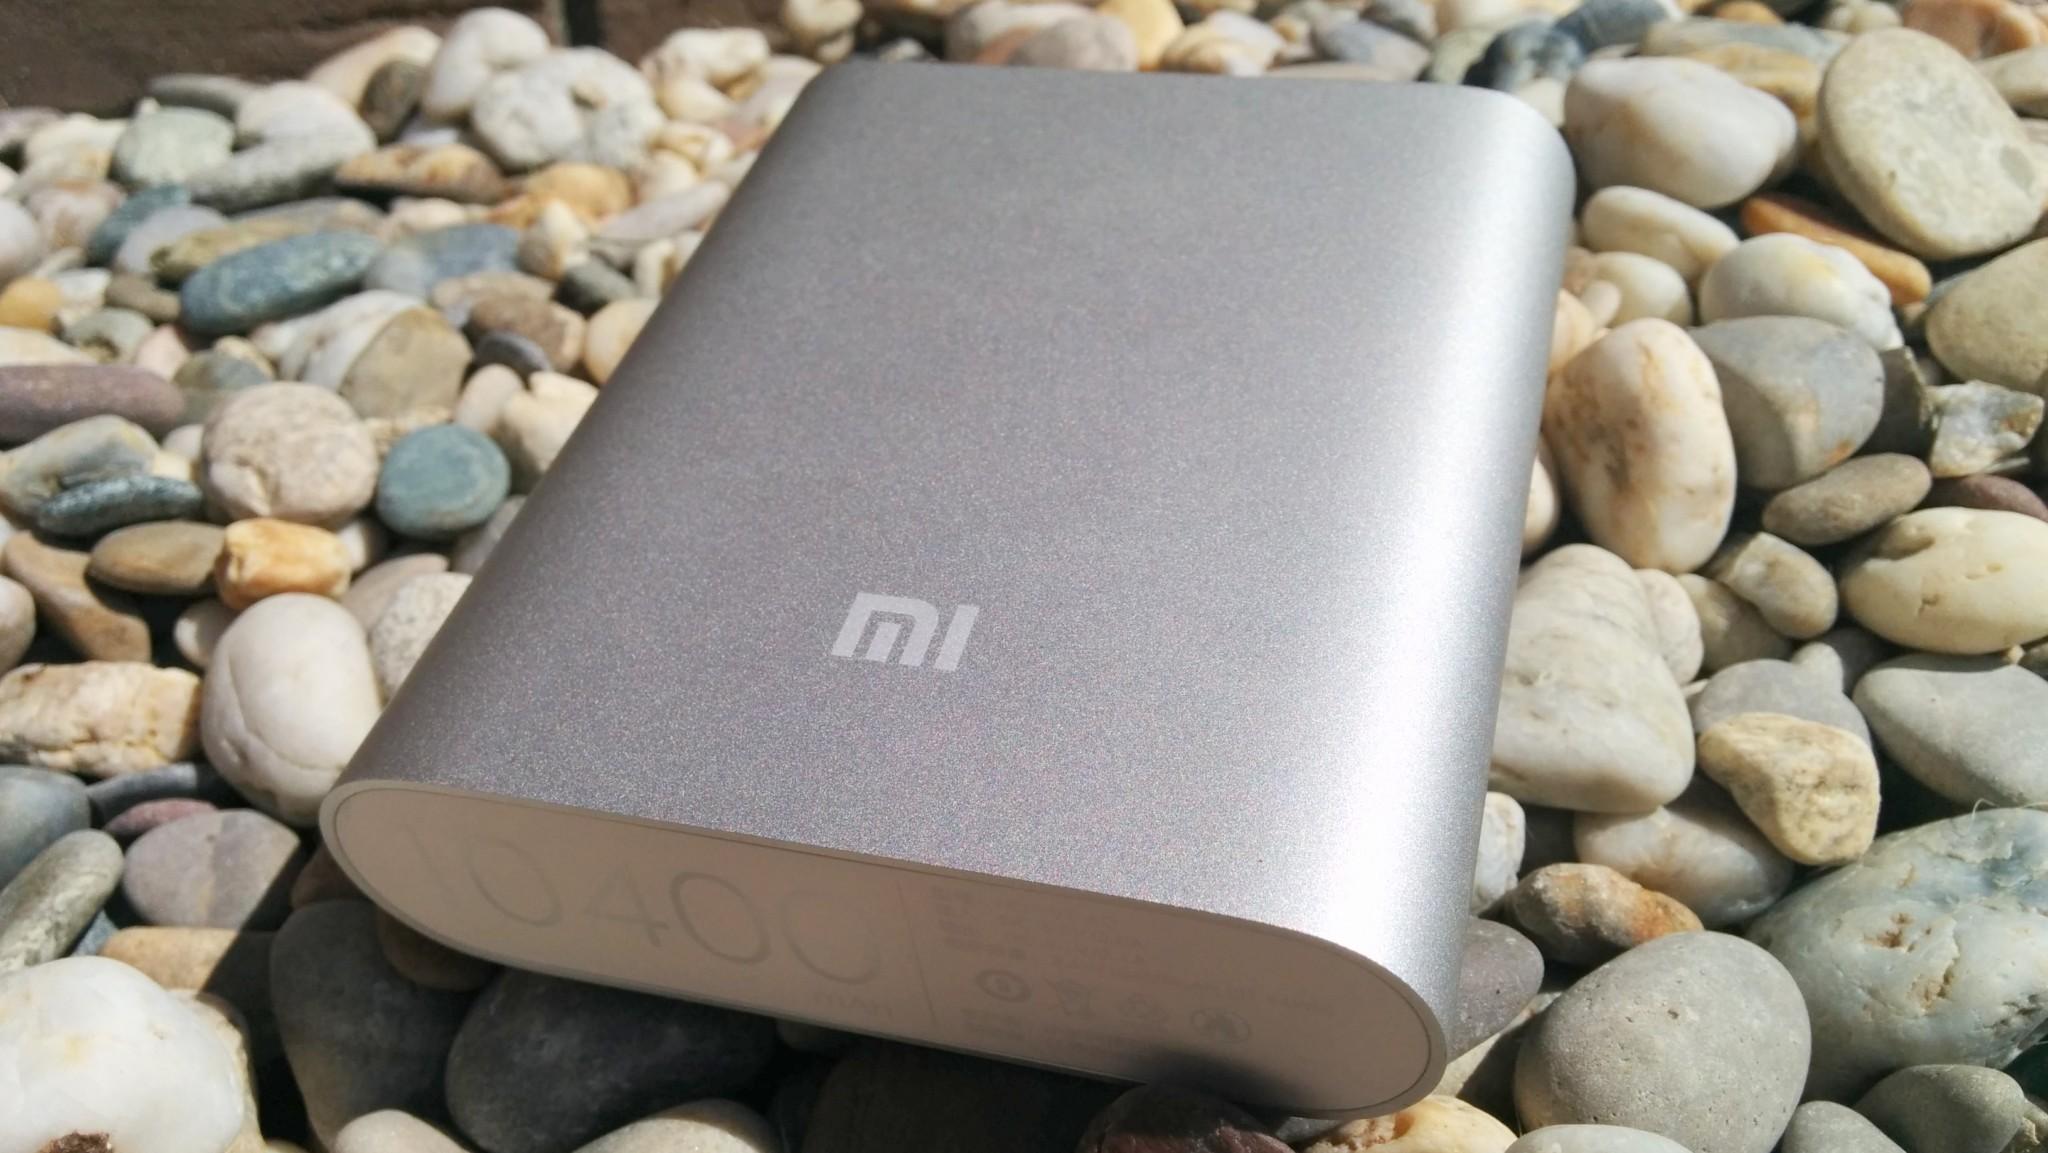 Xiaomi Power Bank 10 400 mAh – macek s pořádnou dávkou energie [recenze]